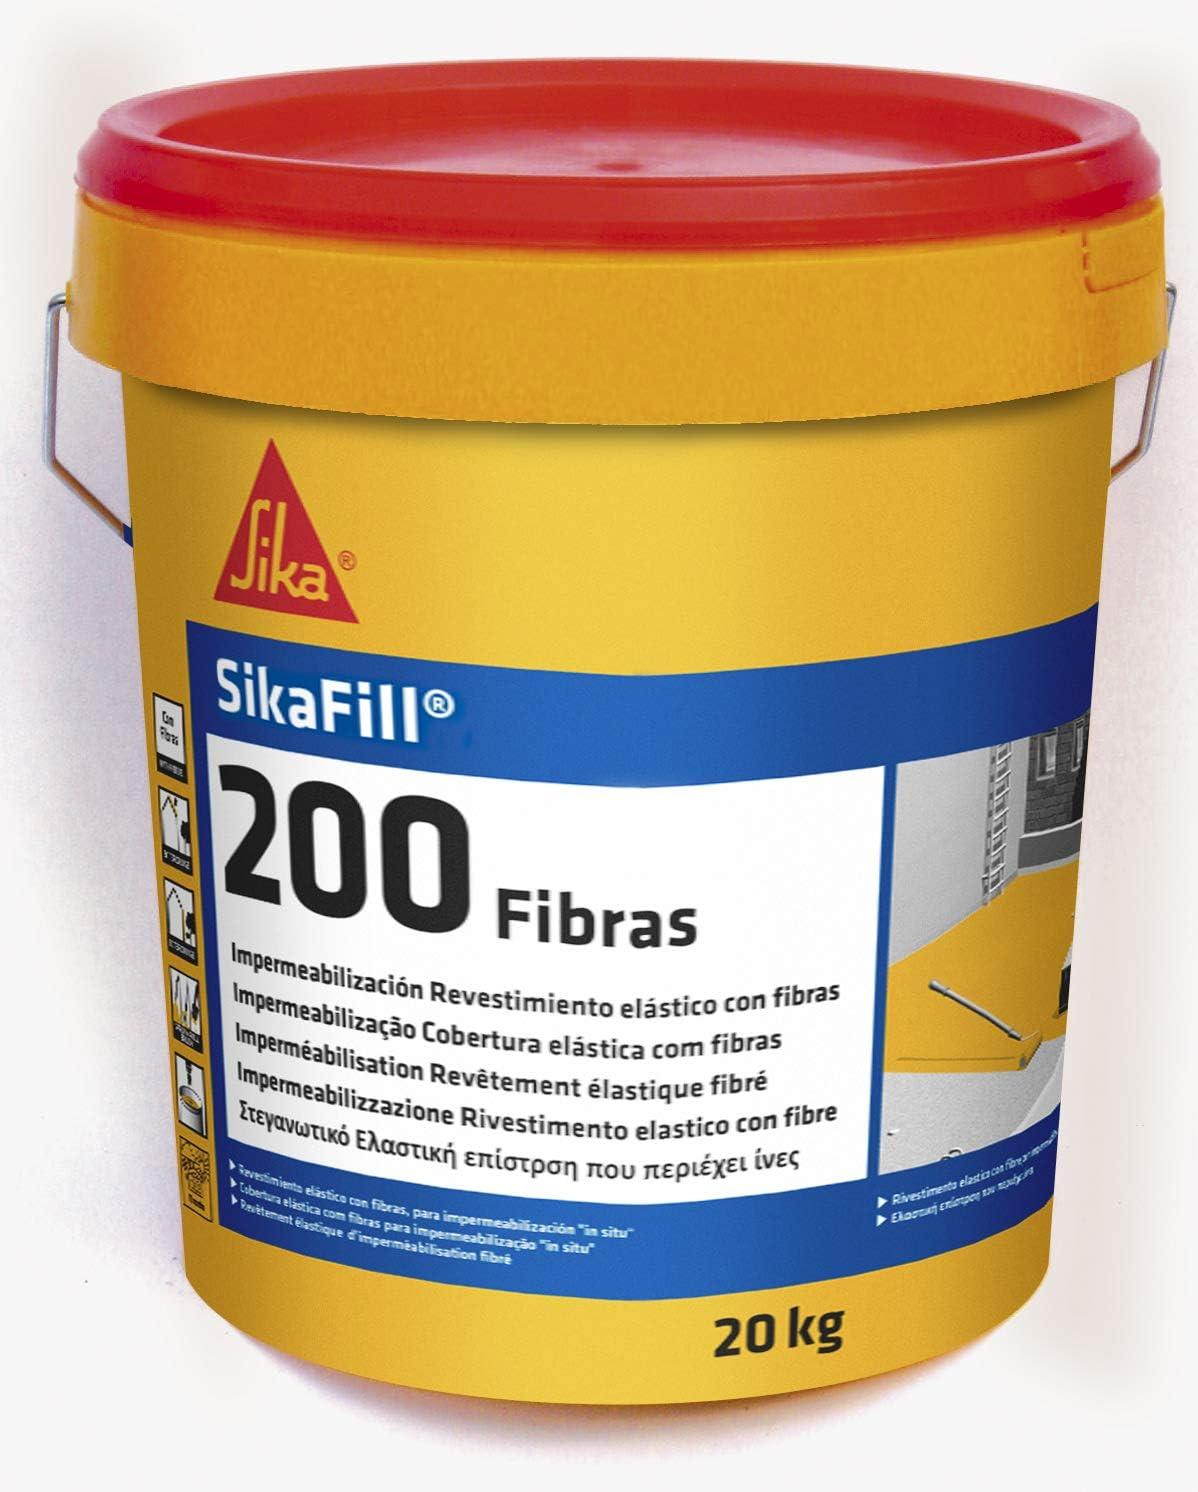 Sika 160649 Fibras Pintura elástica para impermeabilización, Gris, 20kg